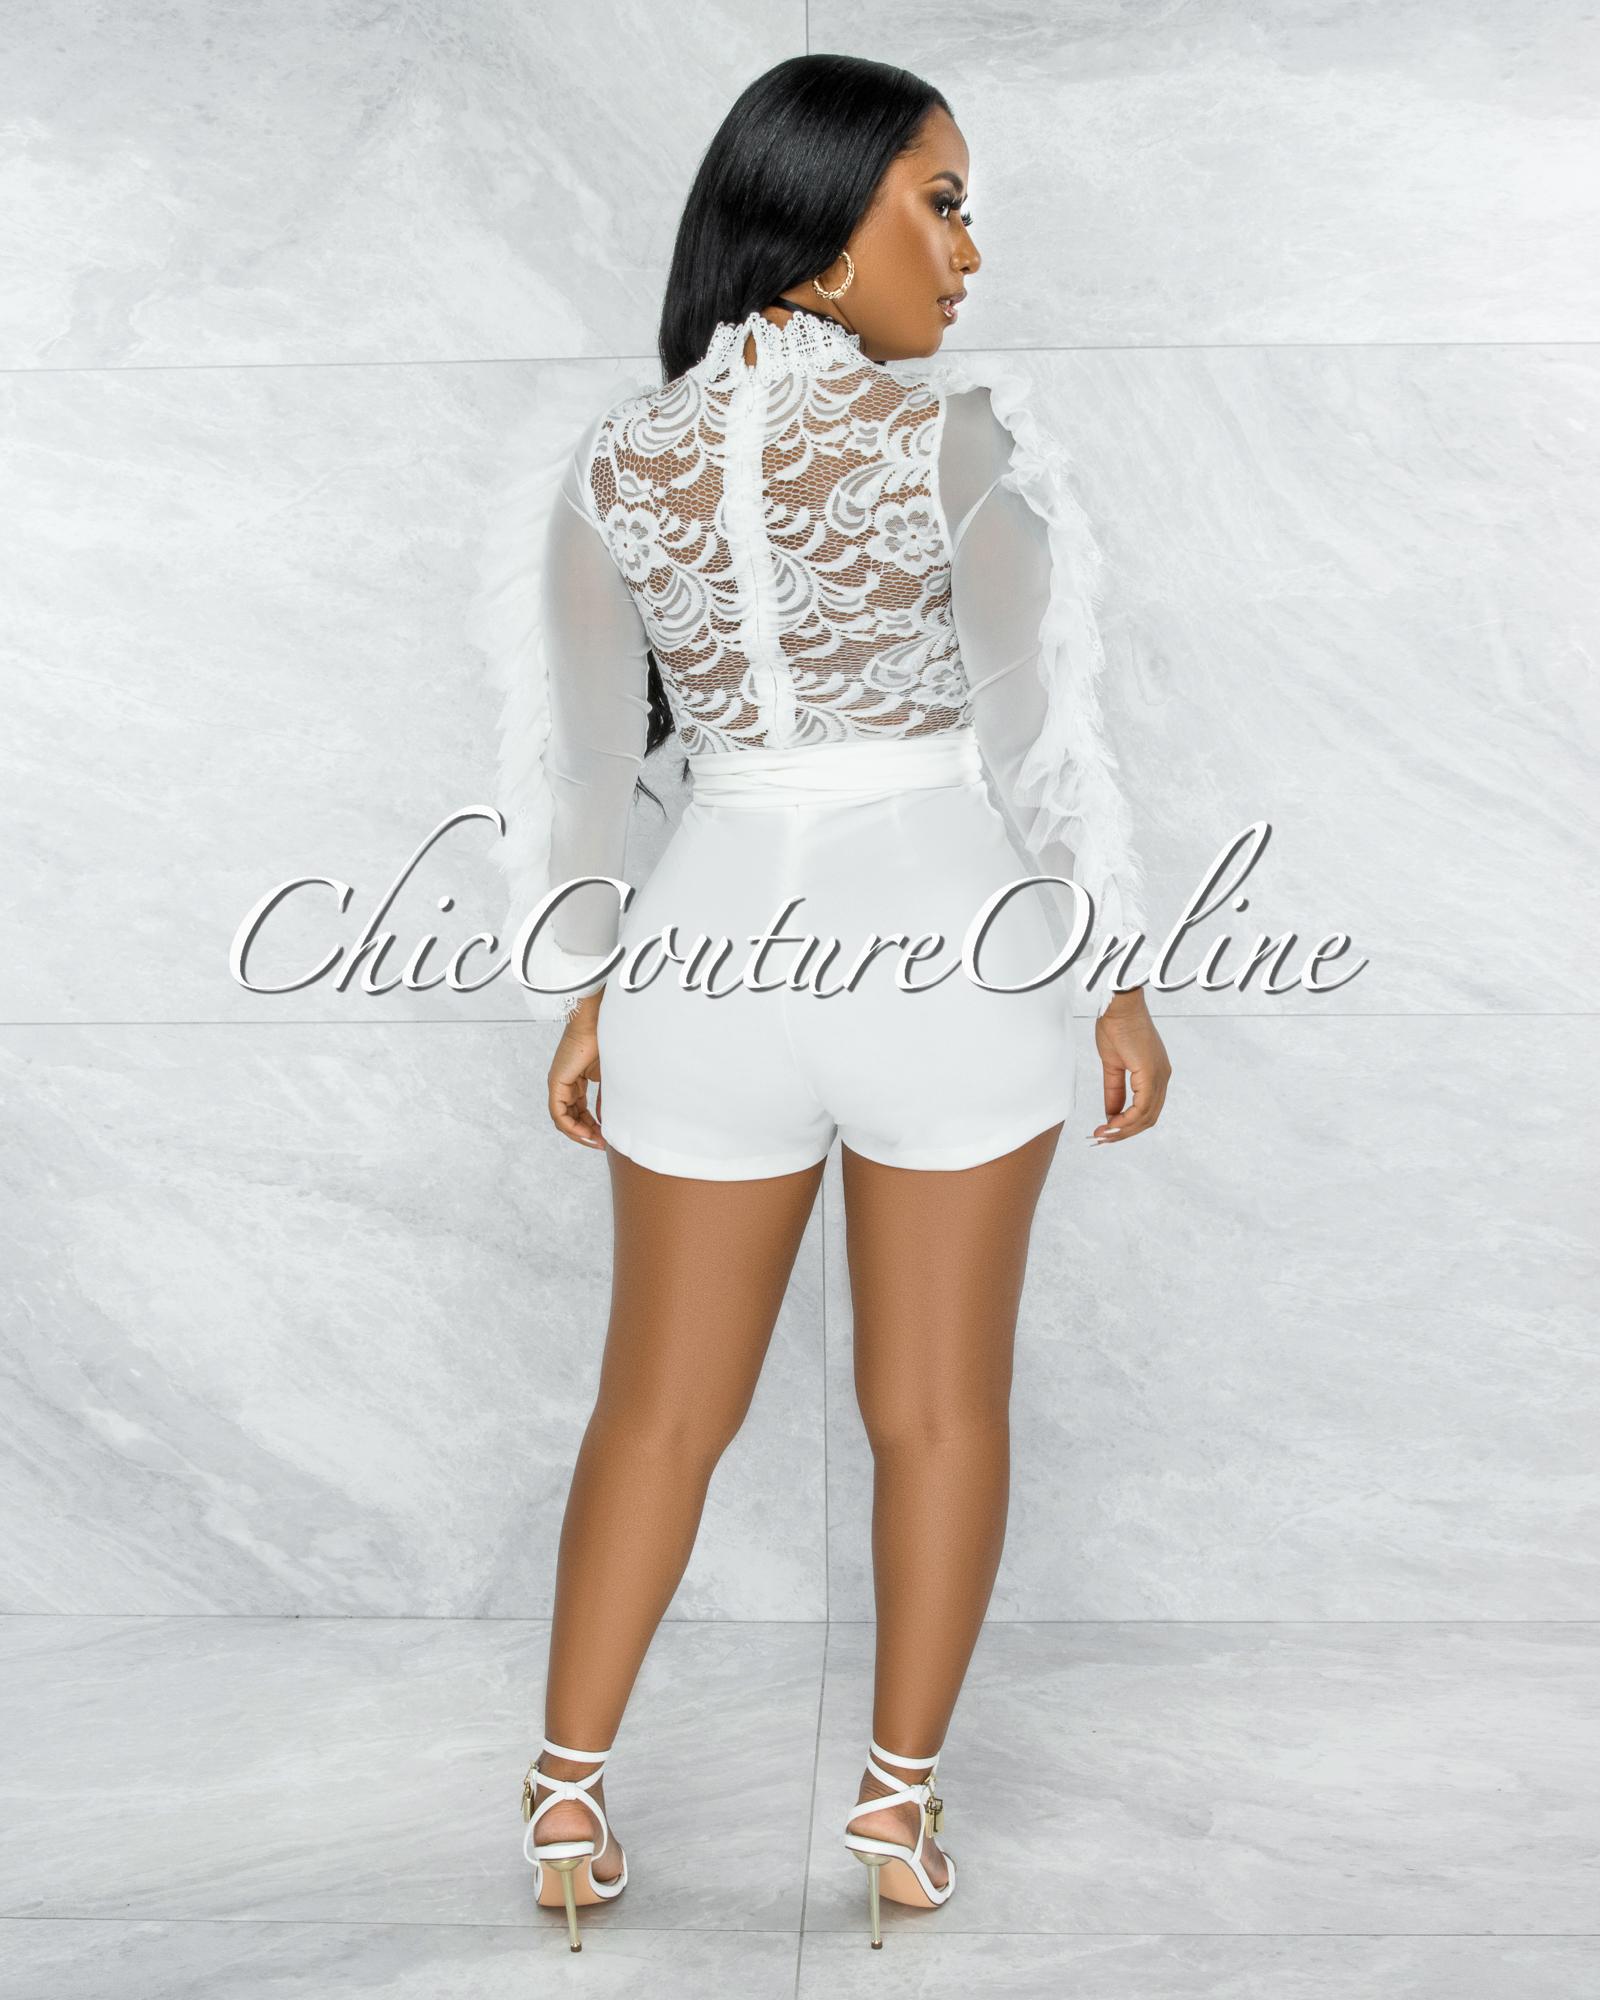 Kacela Off-White Lace Sheer Top Ruffle Sleeves Romper